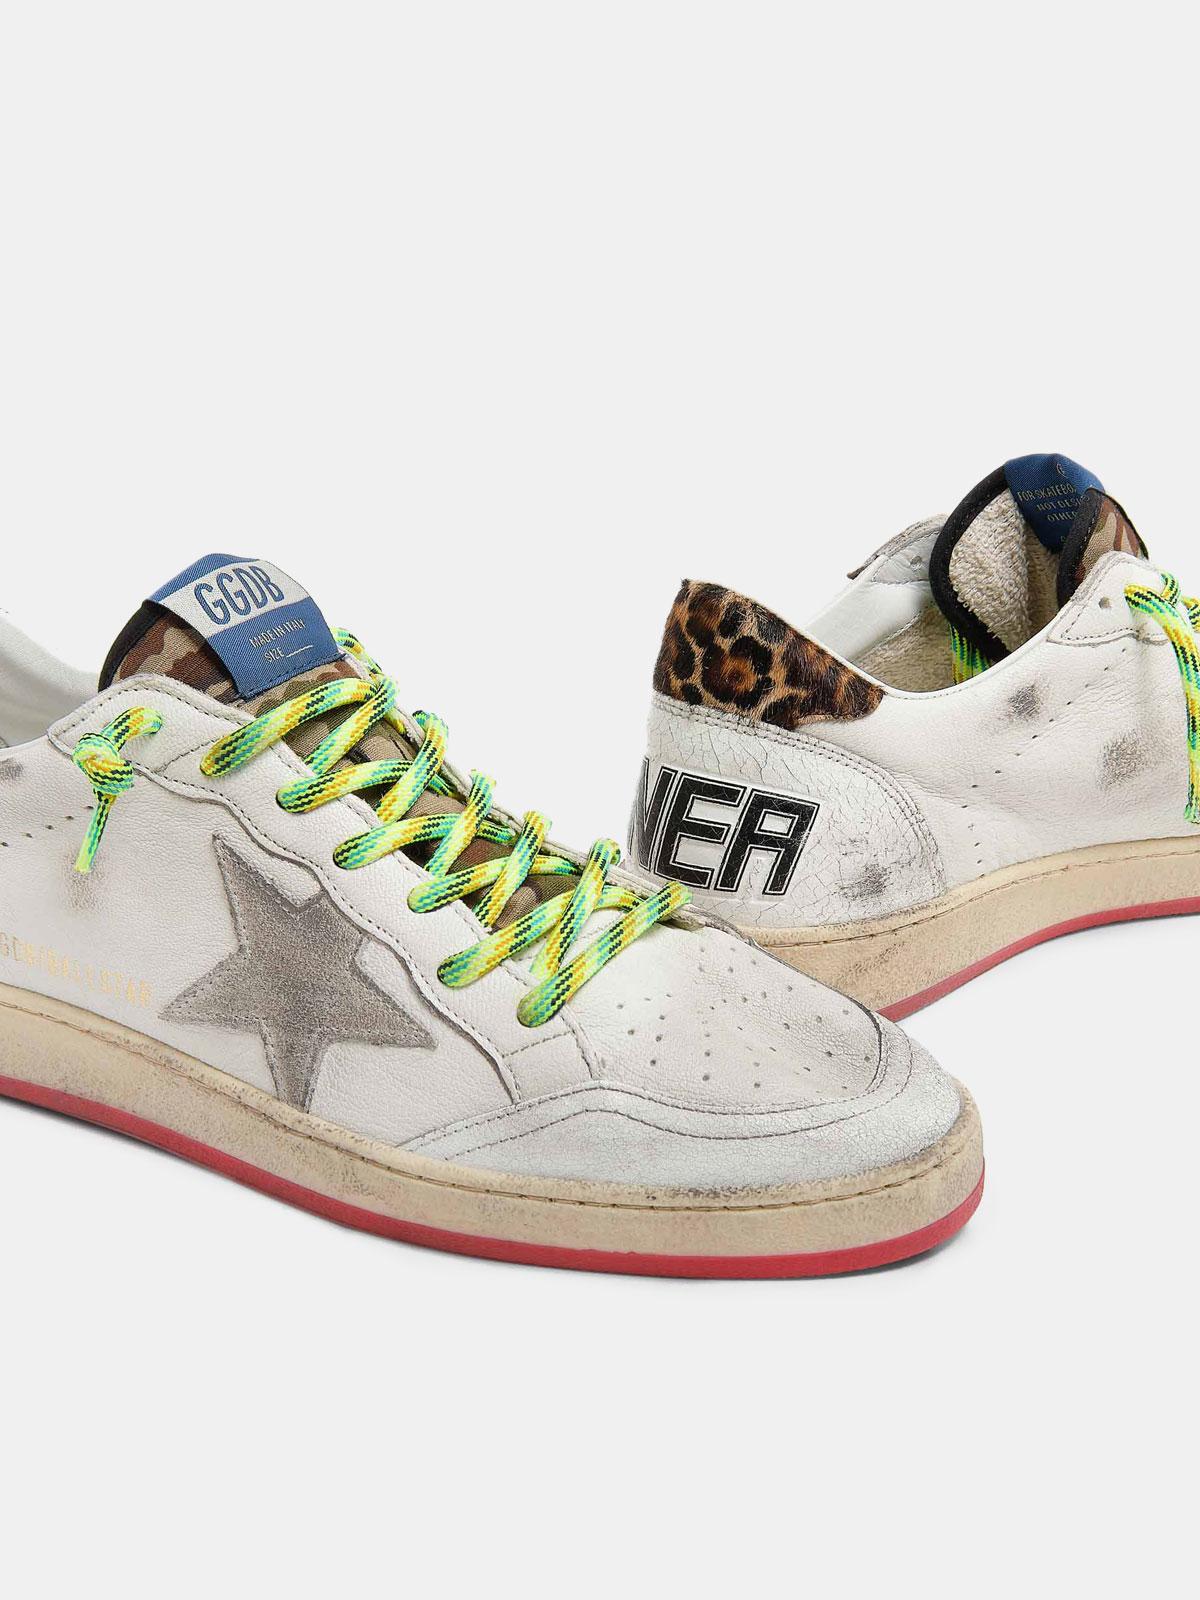 Golden Goose - Sneakers Ball Star in nappa con lacci trekking in